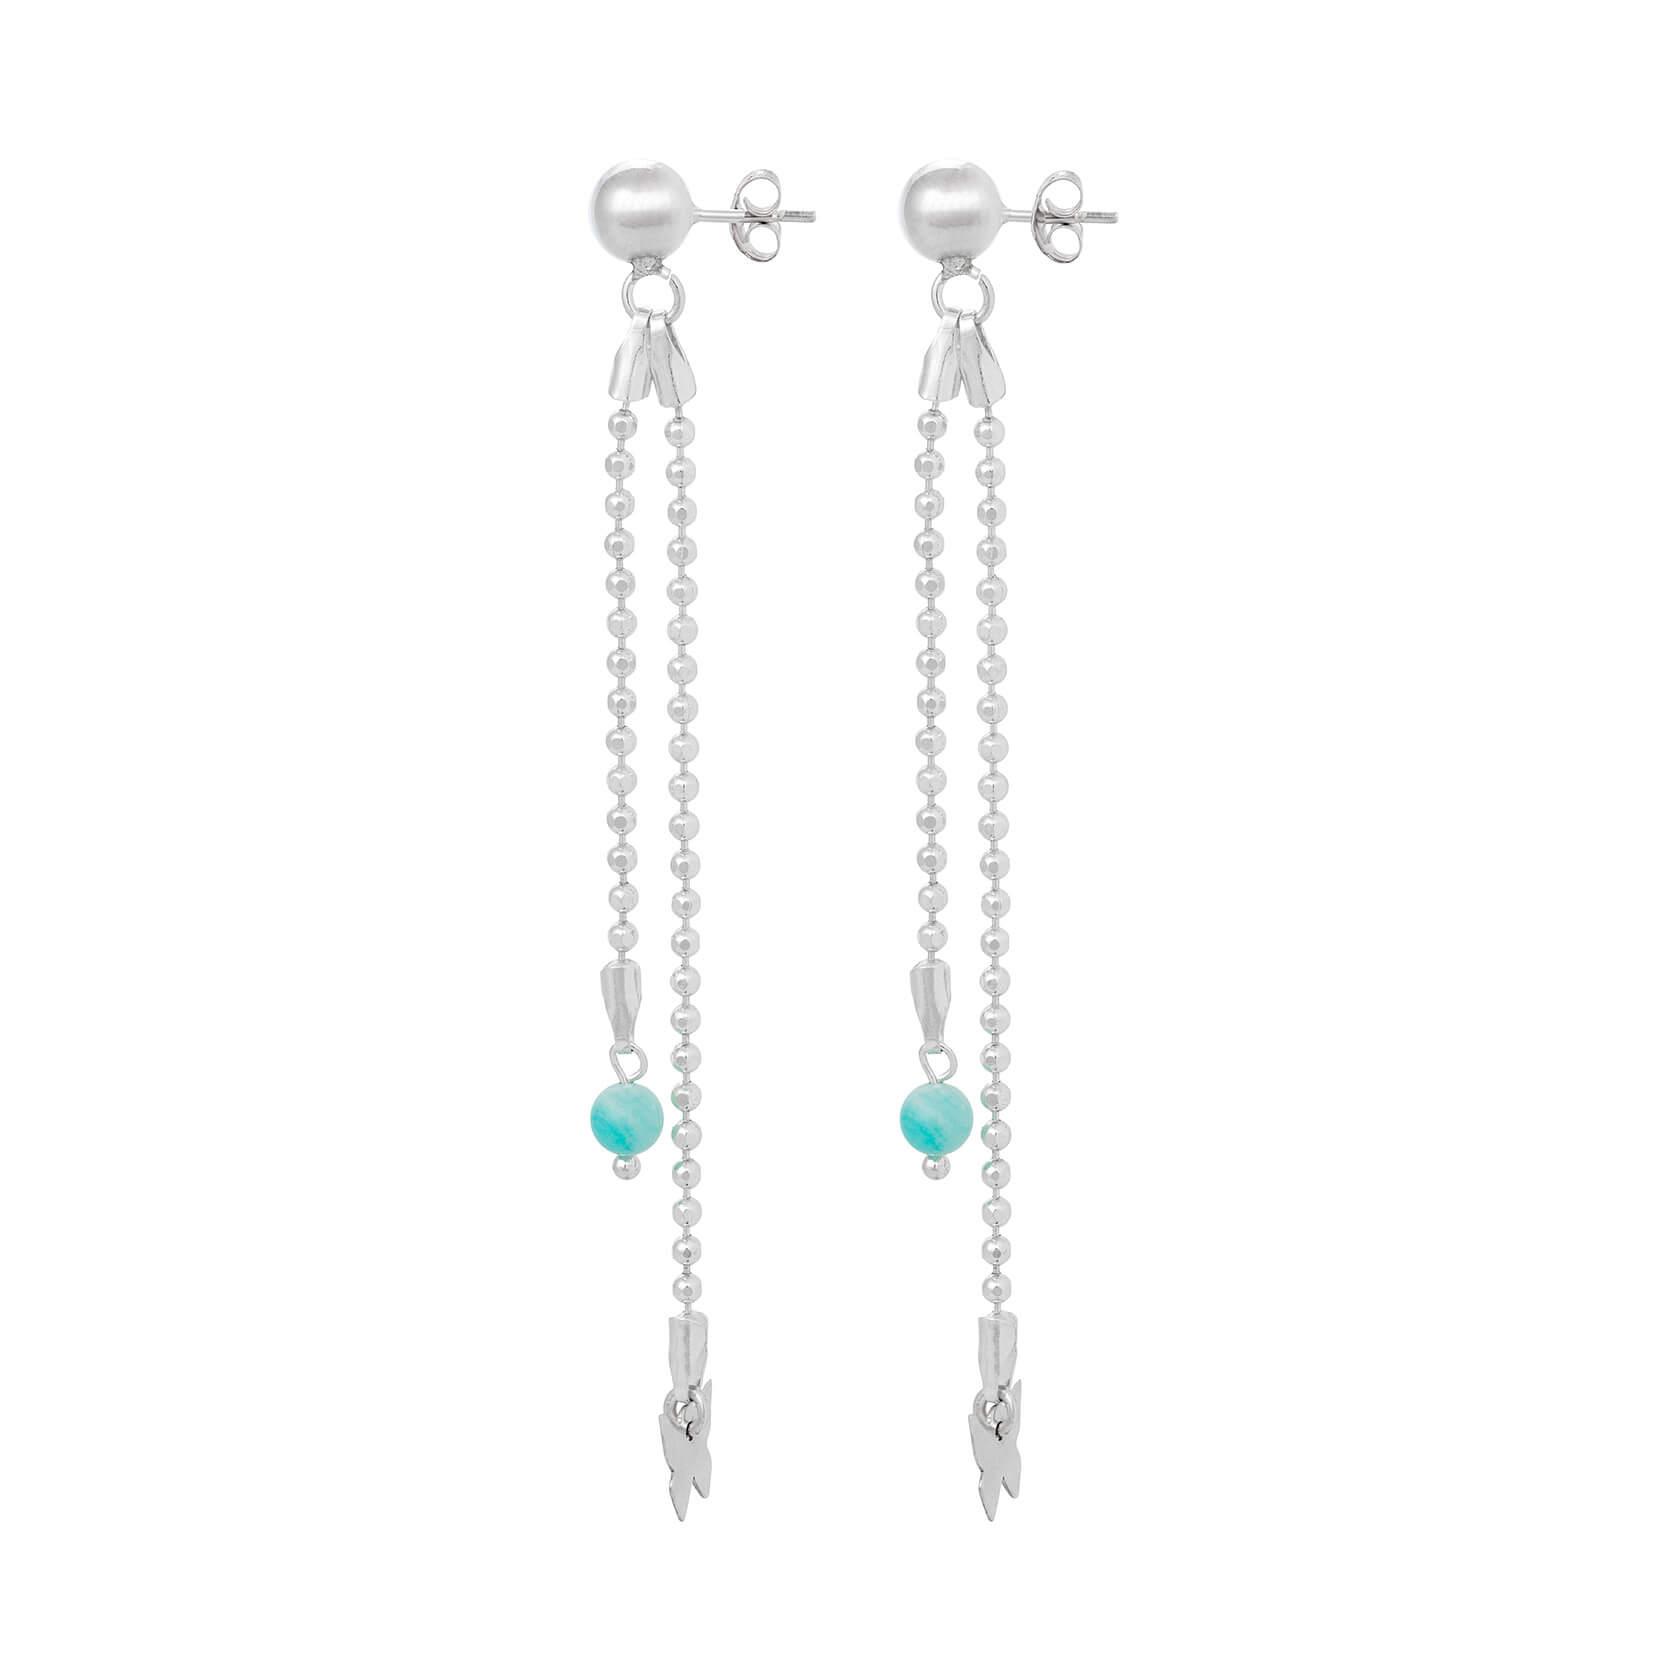 Amazonite long earrings Marybola